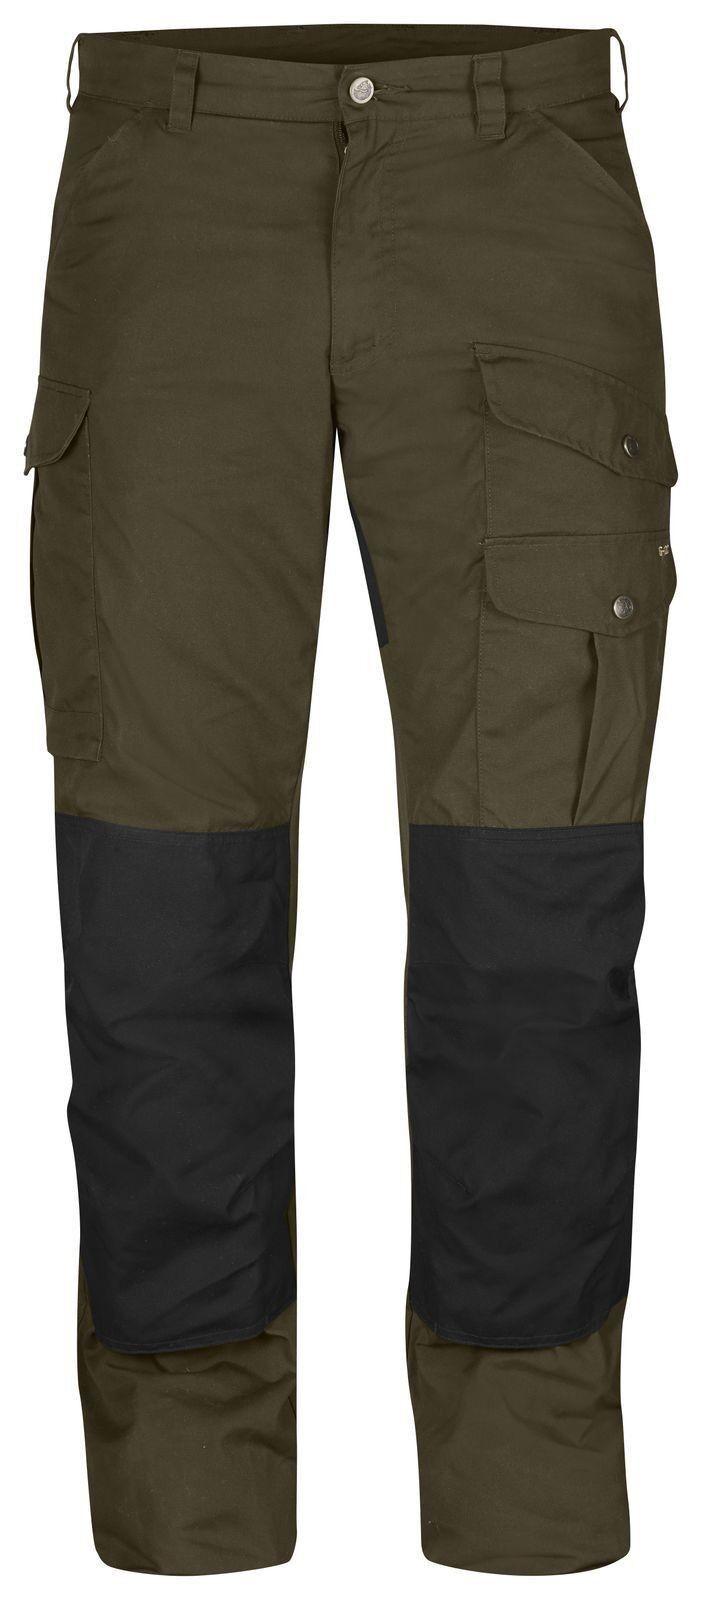 Scendendo Räven Barents Pro inverno all'apertohose Trekre Pantaloni 81144 tg. 46 Dark Olive